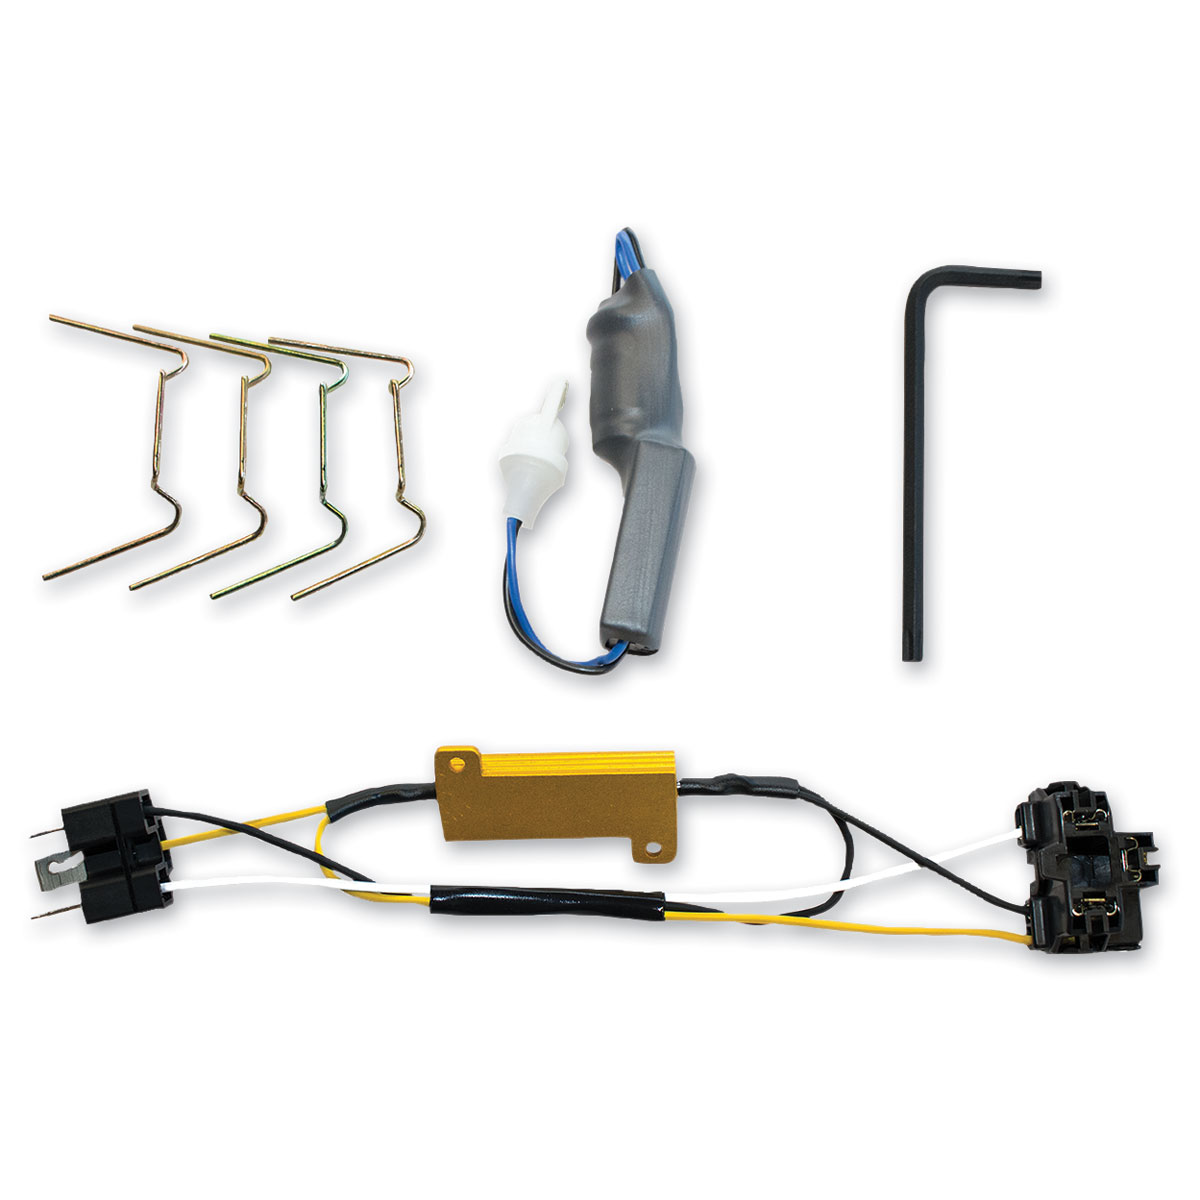 J.W. Speaker Headlight Installation Kit Wiring Harness